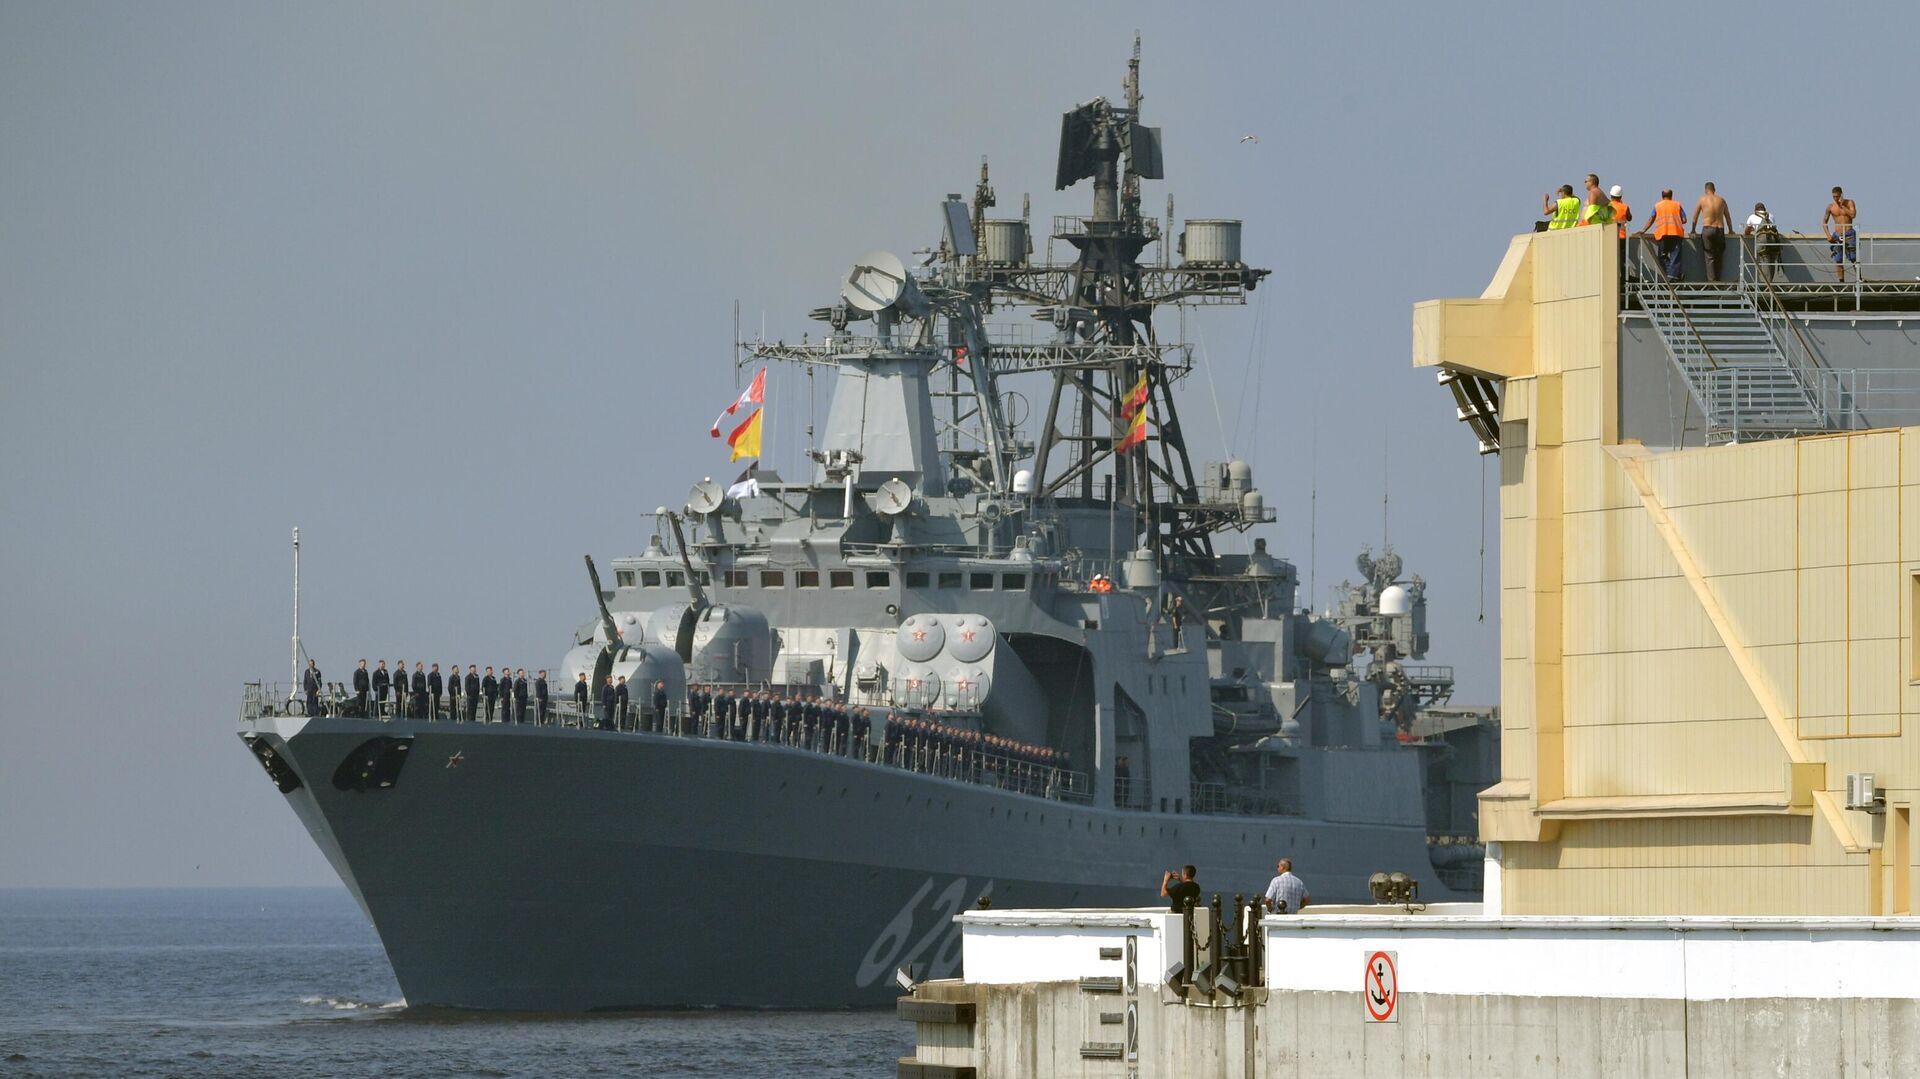 El buque antisubmarino ruso Vicealmirante Kulakov - Sputnik Mundo, 1920, 21.08.2021